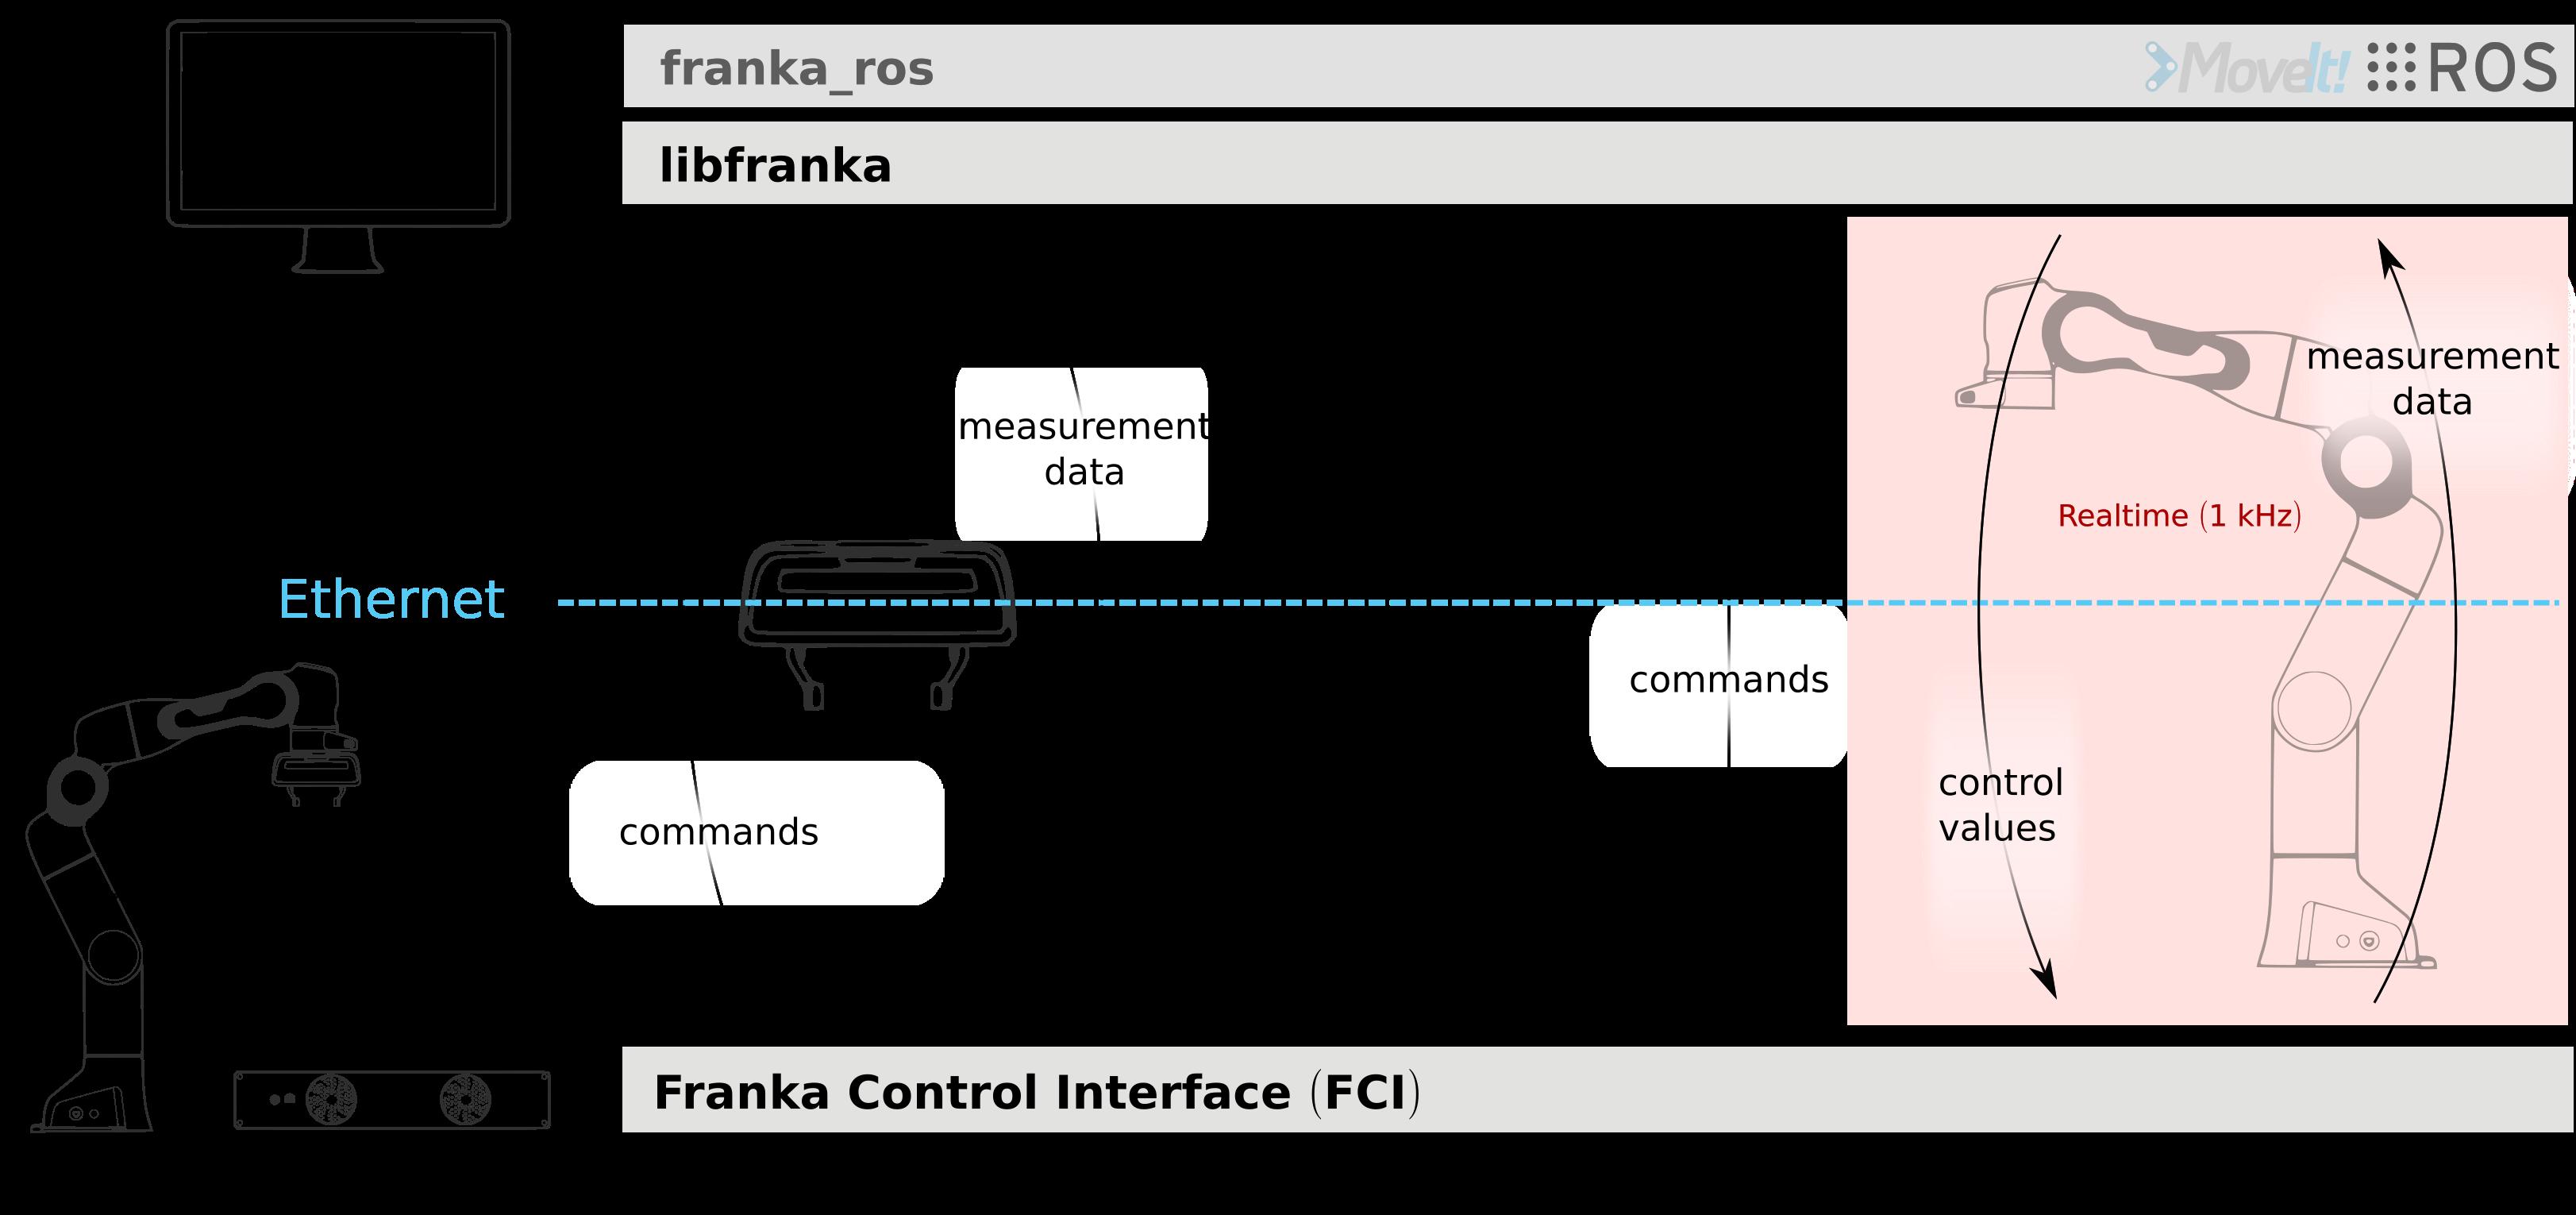 libfranka — Franka Control Interface (FCI) documentation